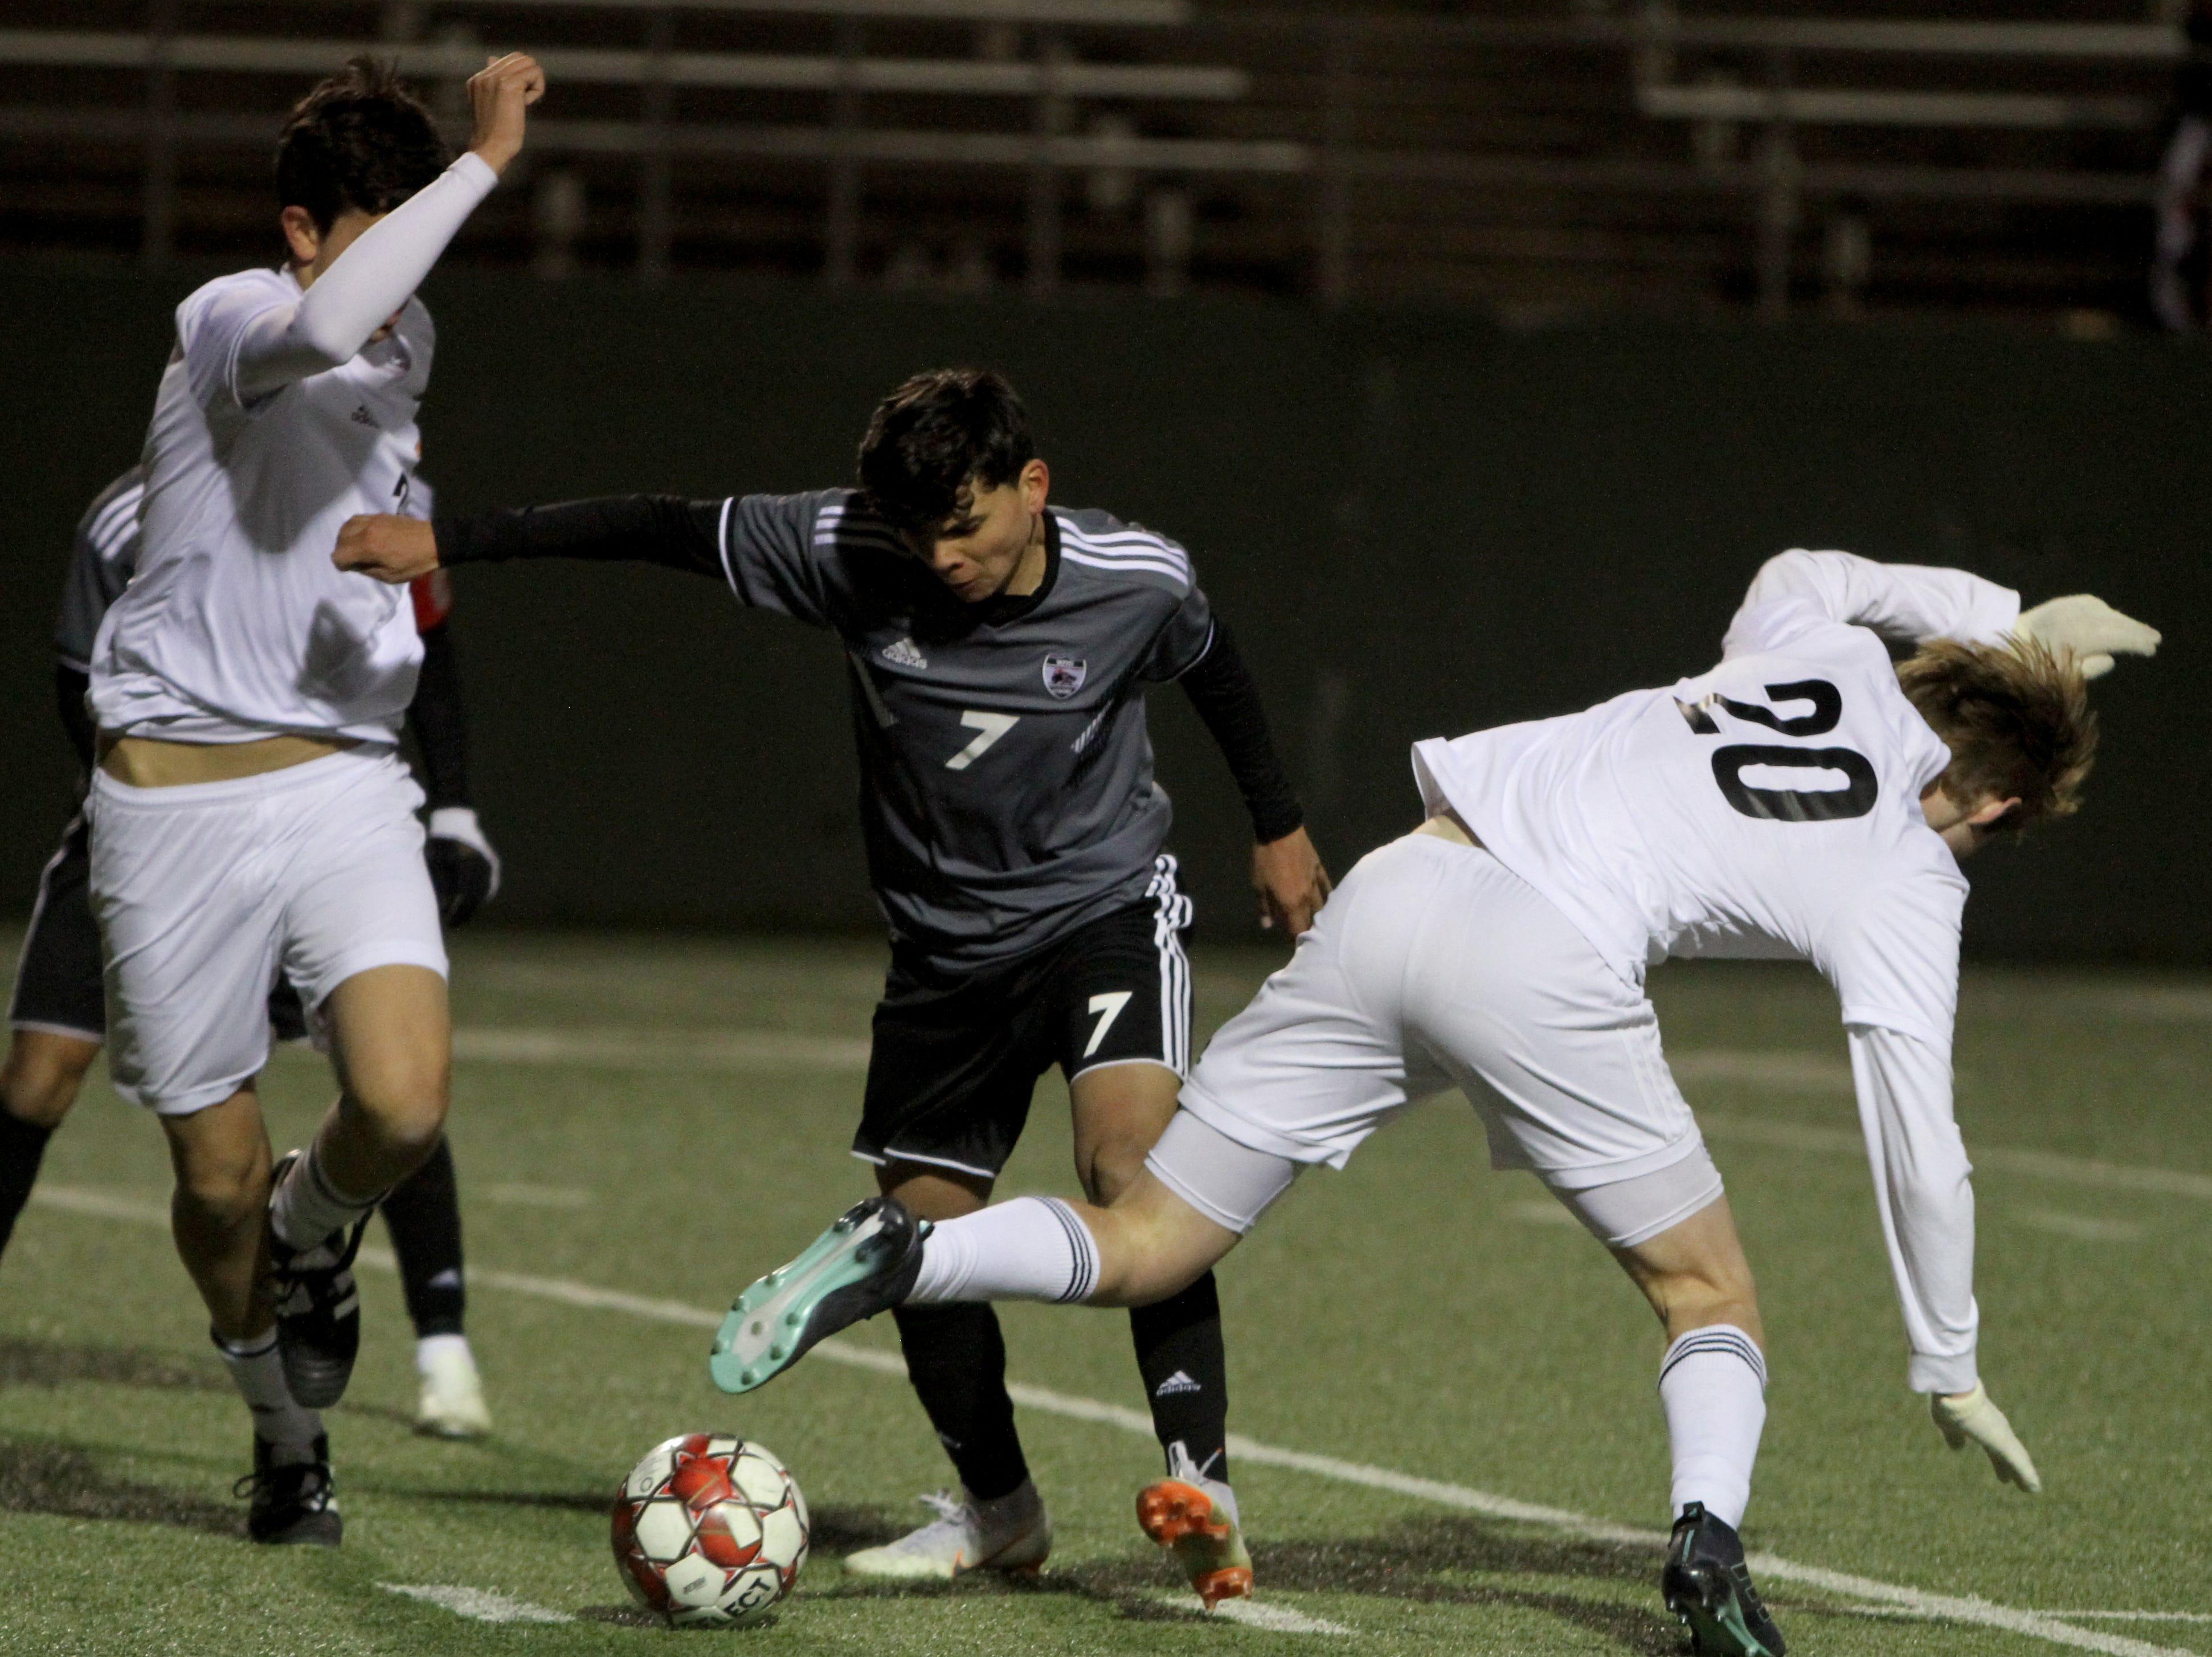 Wichita Falls High School's Daniel Alvarez dribbles between Aledo defenders Tuesday, March 5, 2019, at Memorial Stadium.